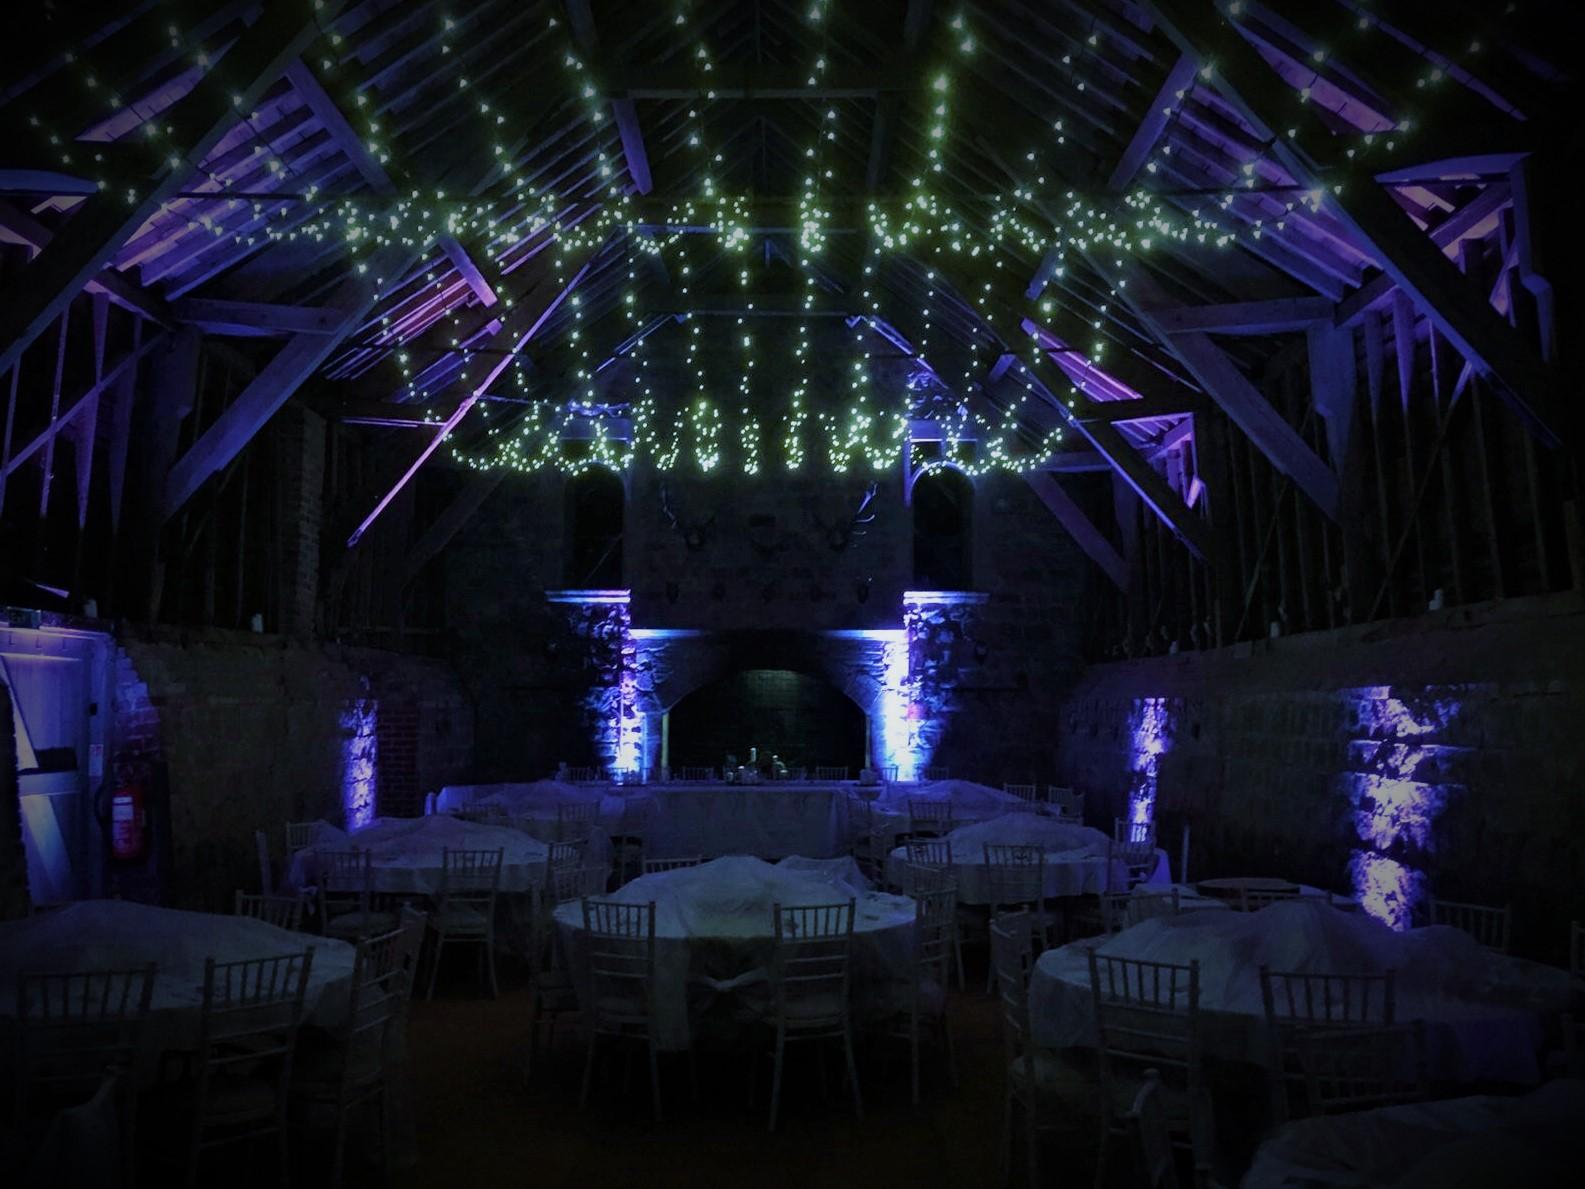 Wick Bottom Barn Fairy Lighting